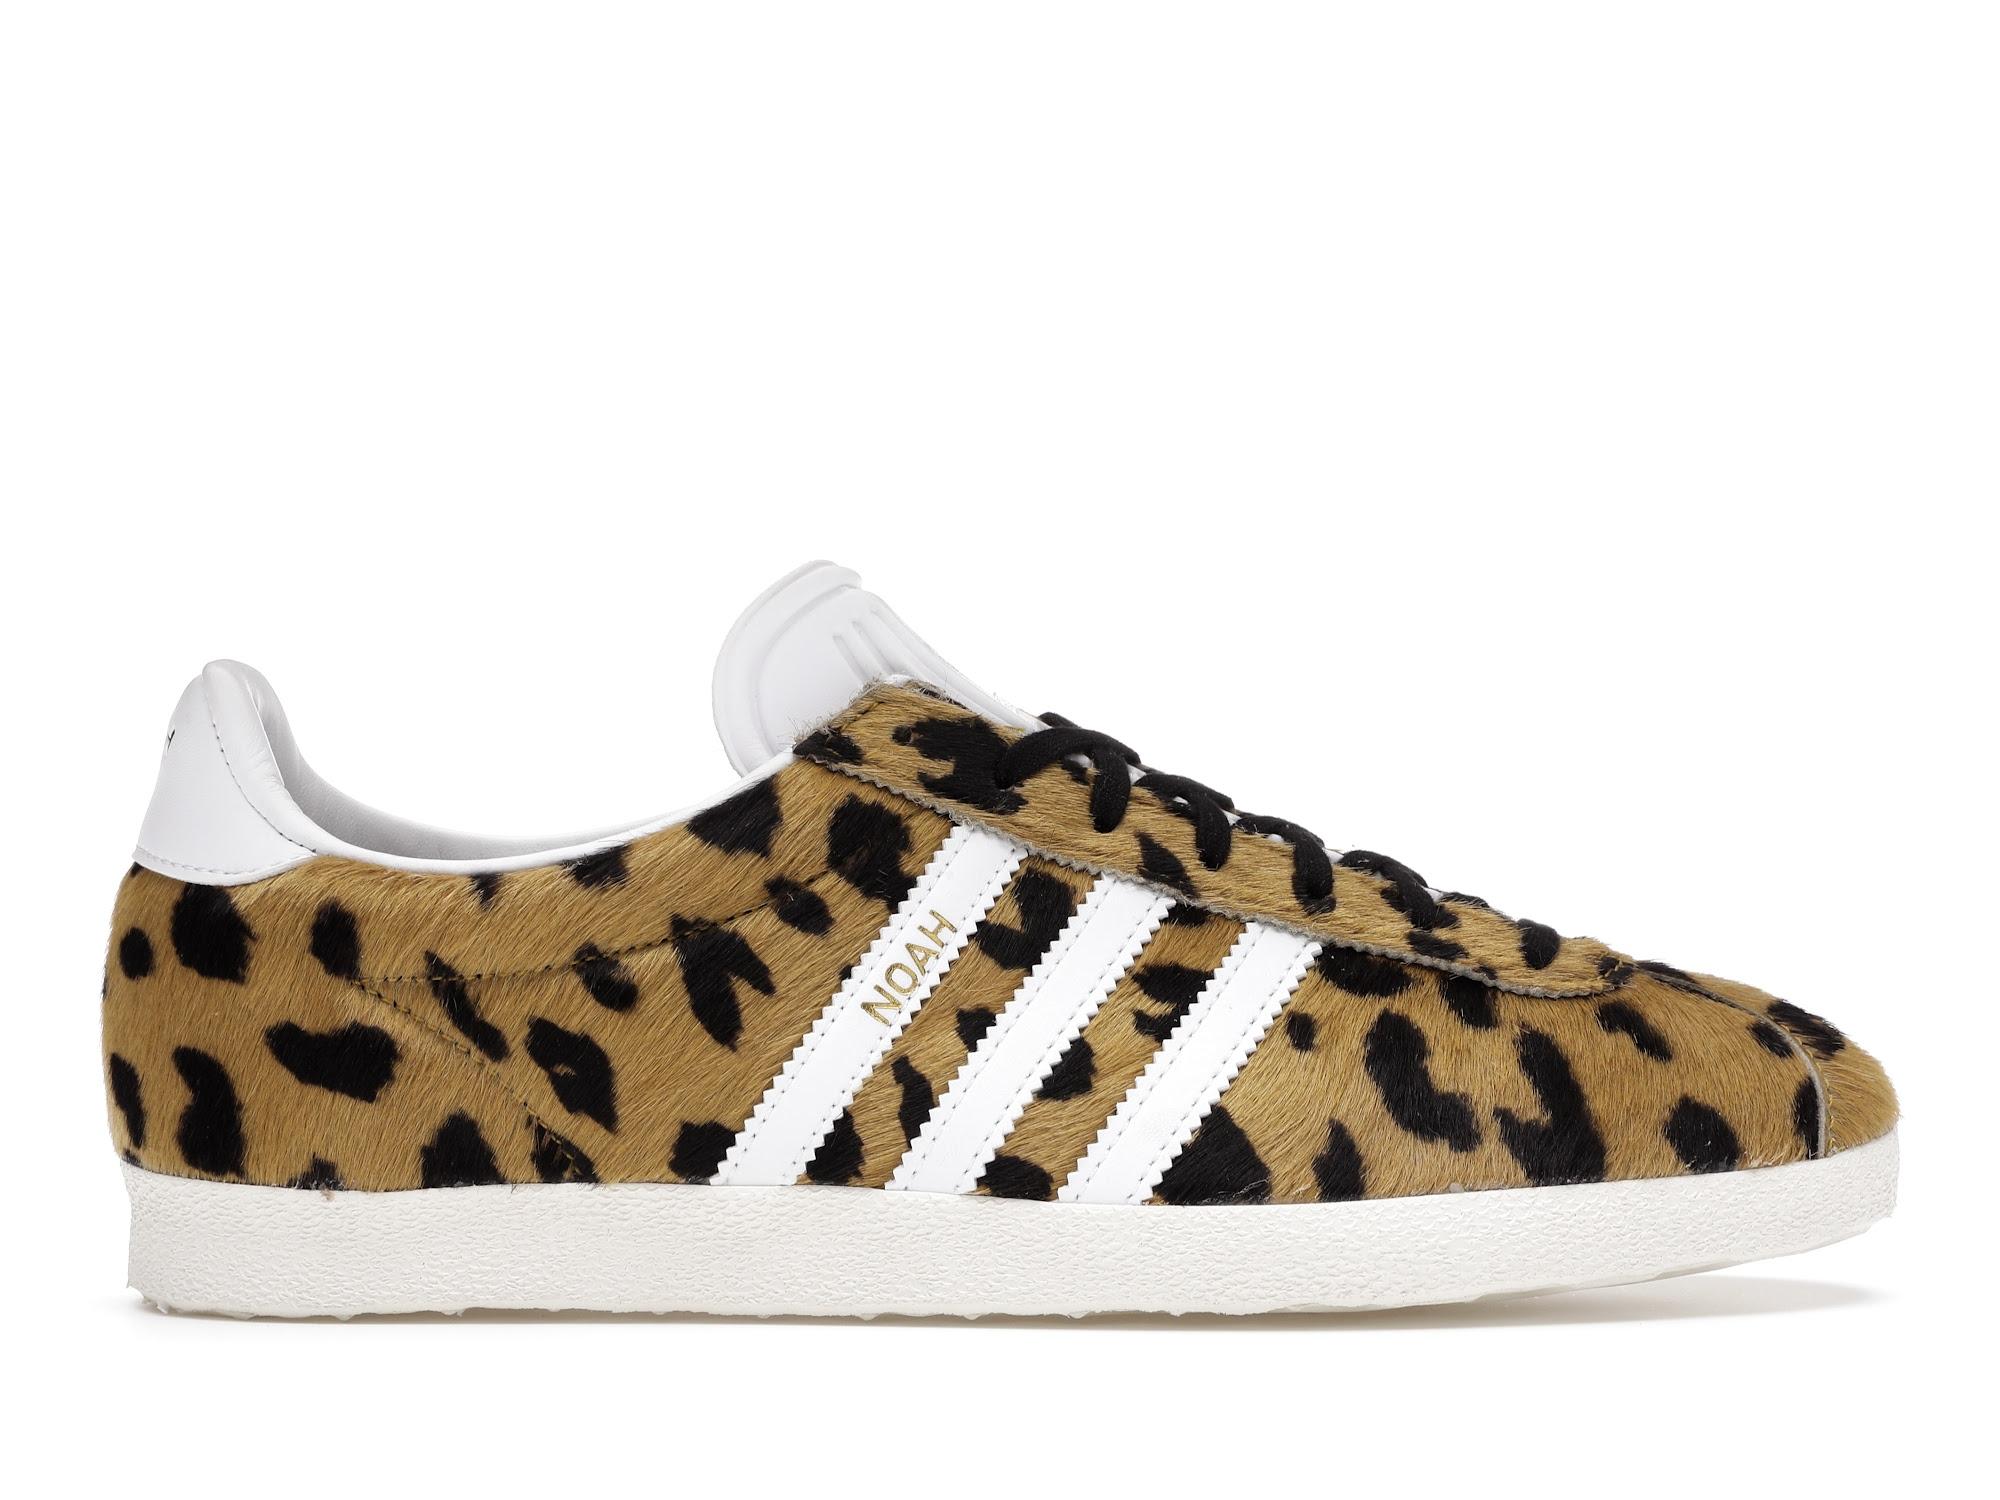 adidas Gazelle NOAH Cheetah